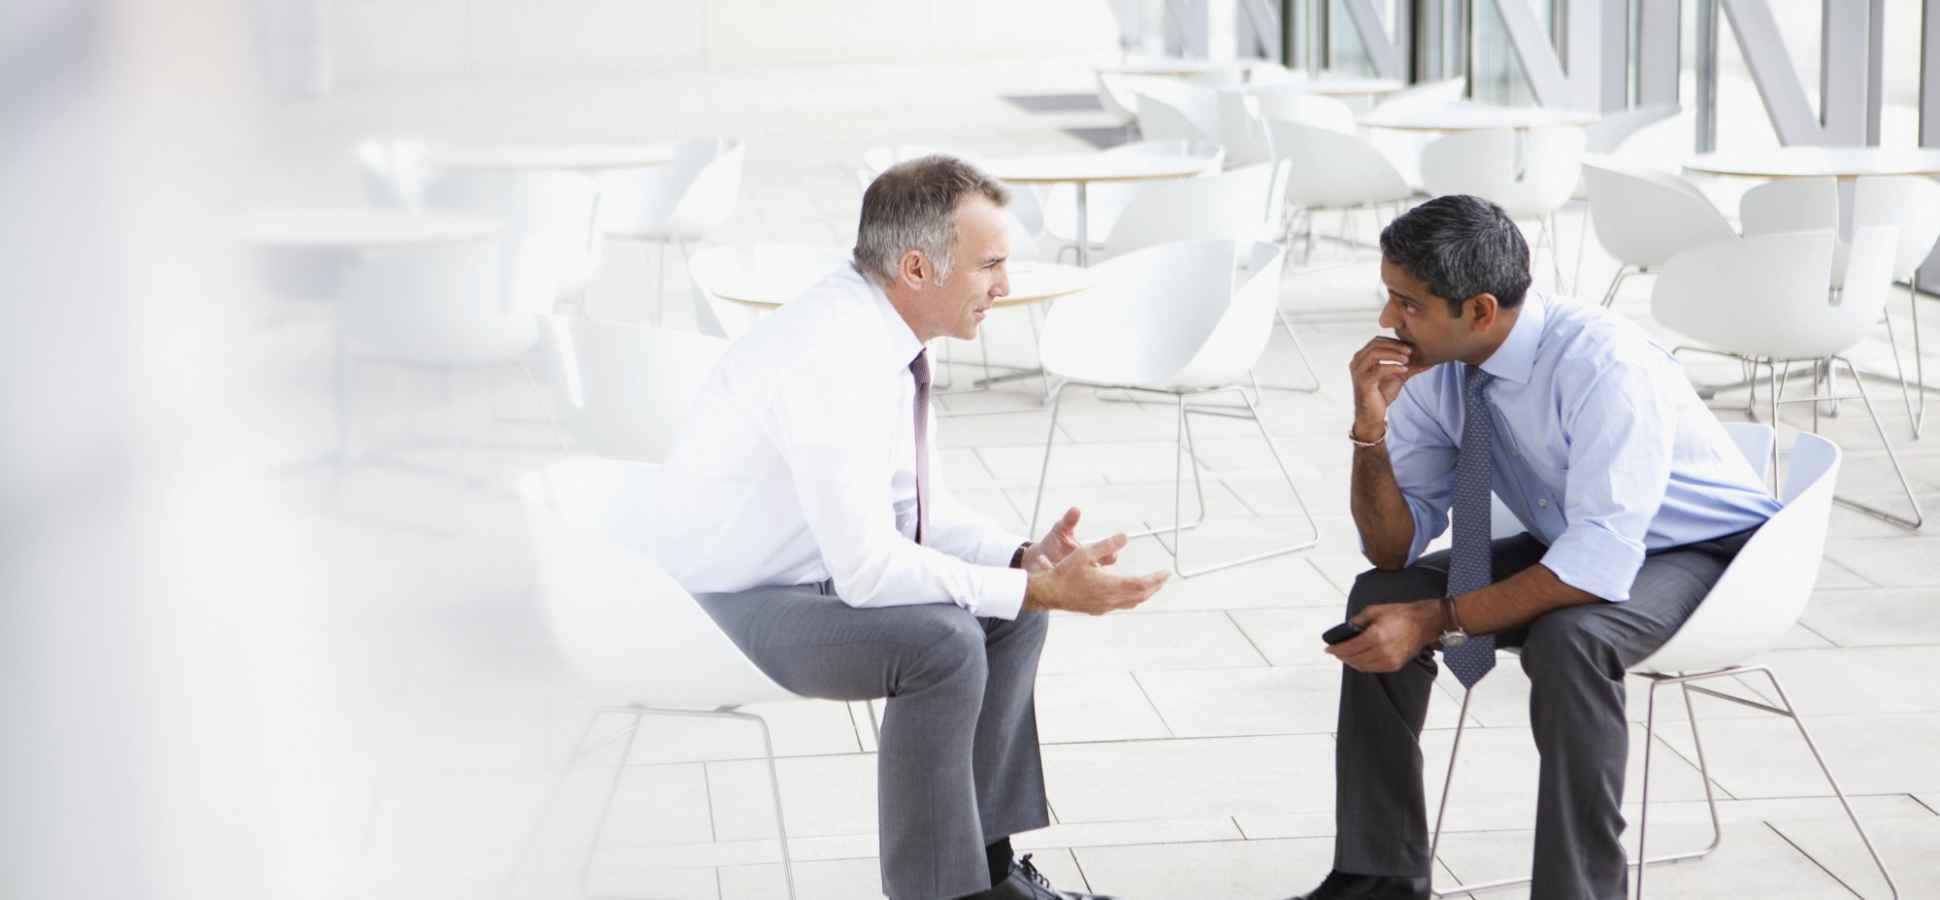 7 Bad Public Speaking Habits That Immediately Destroy Your Likability